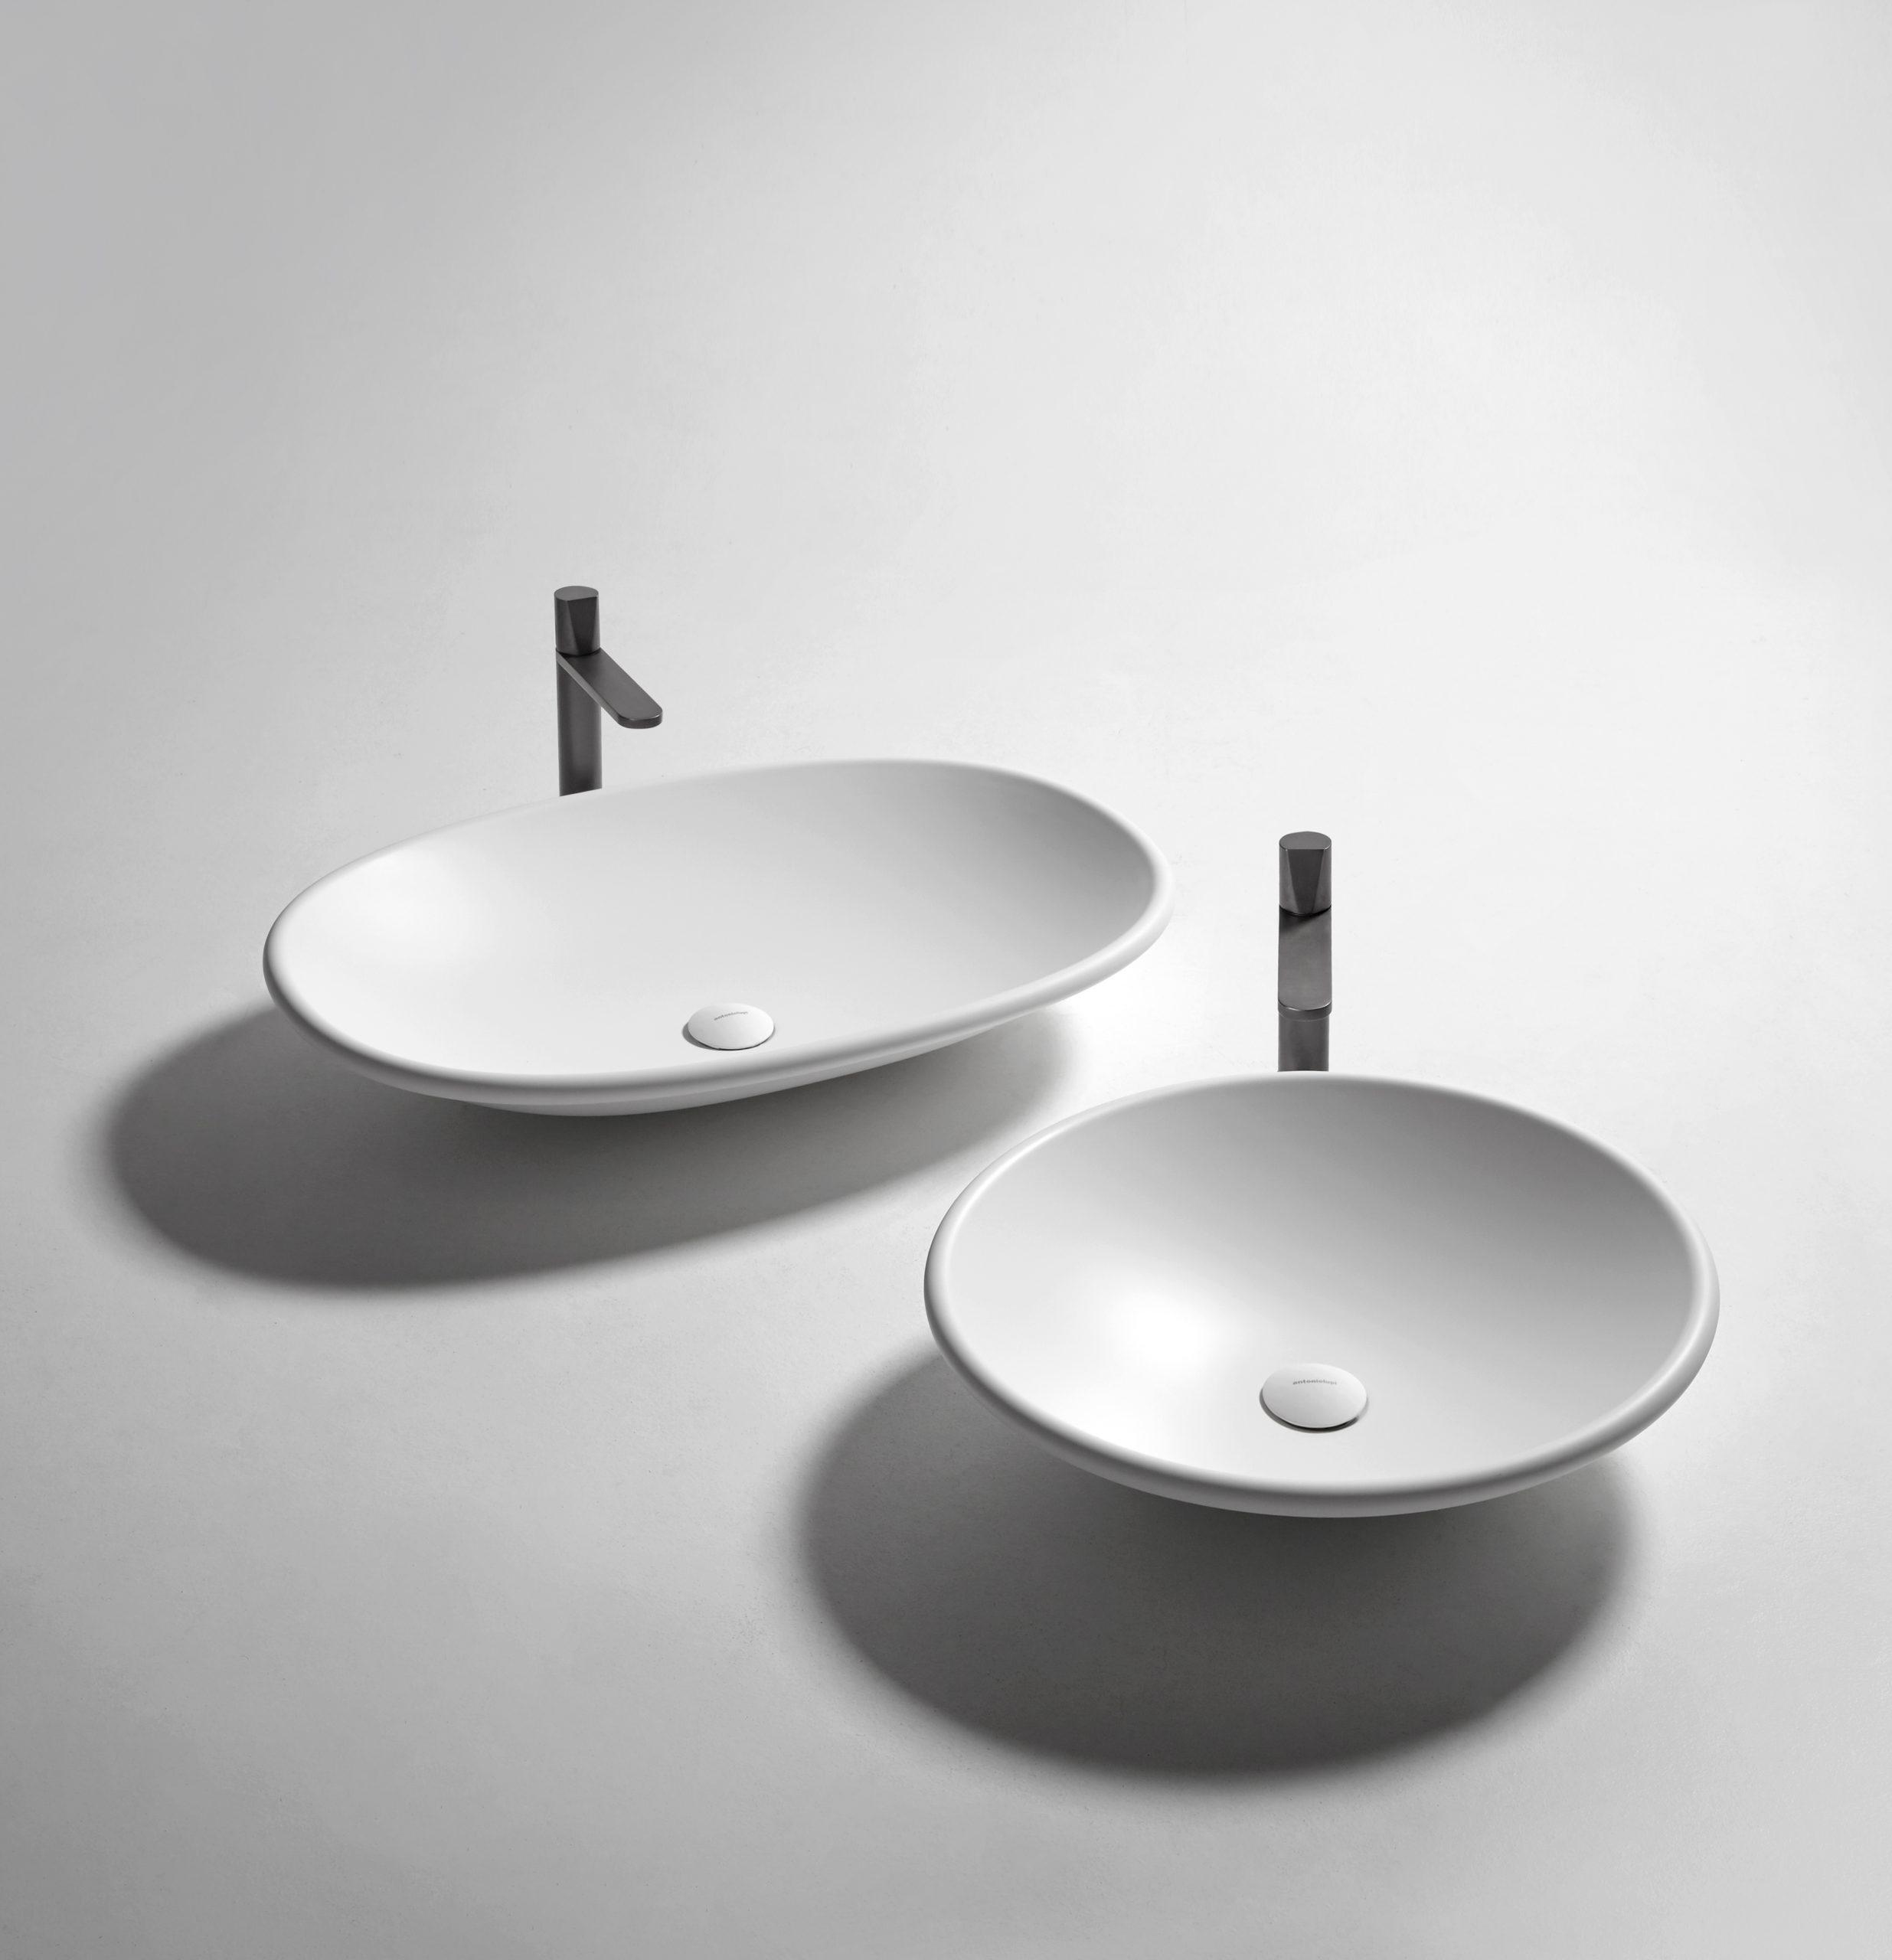 Rim Washbowls designed by Debiasi Sandri for Antoniolupi